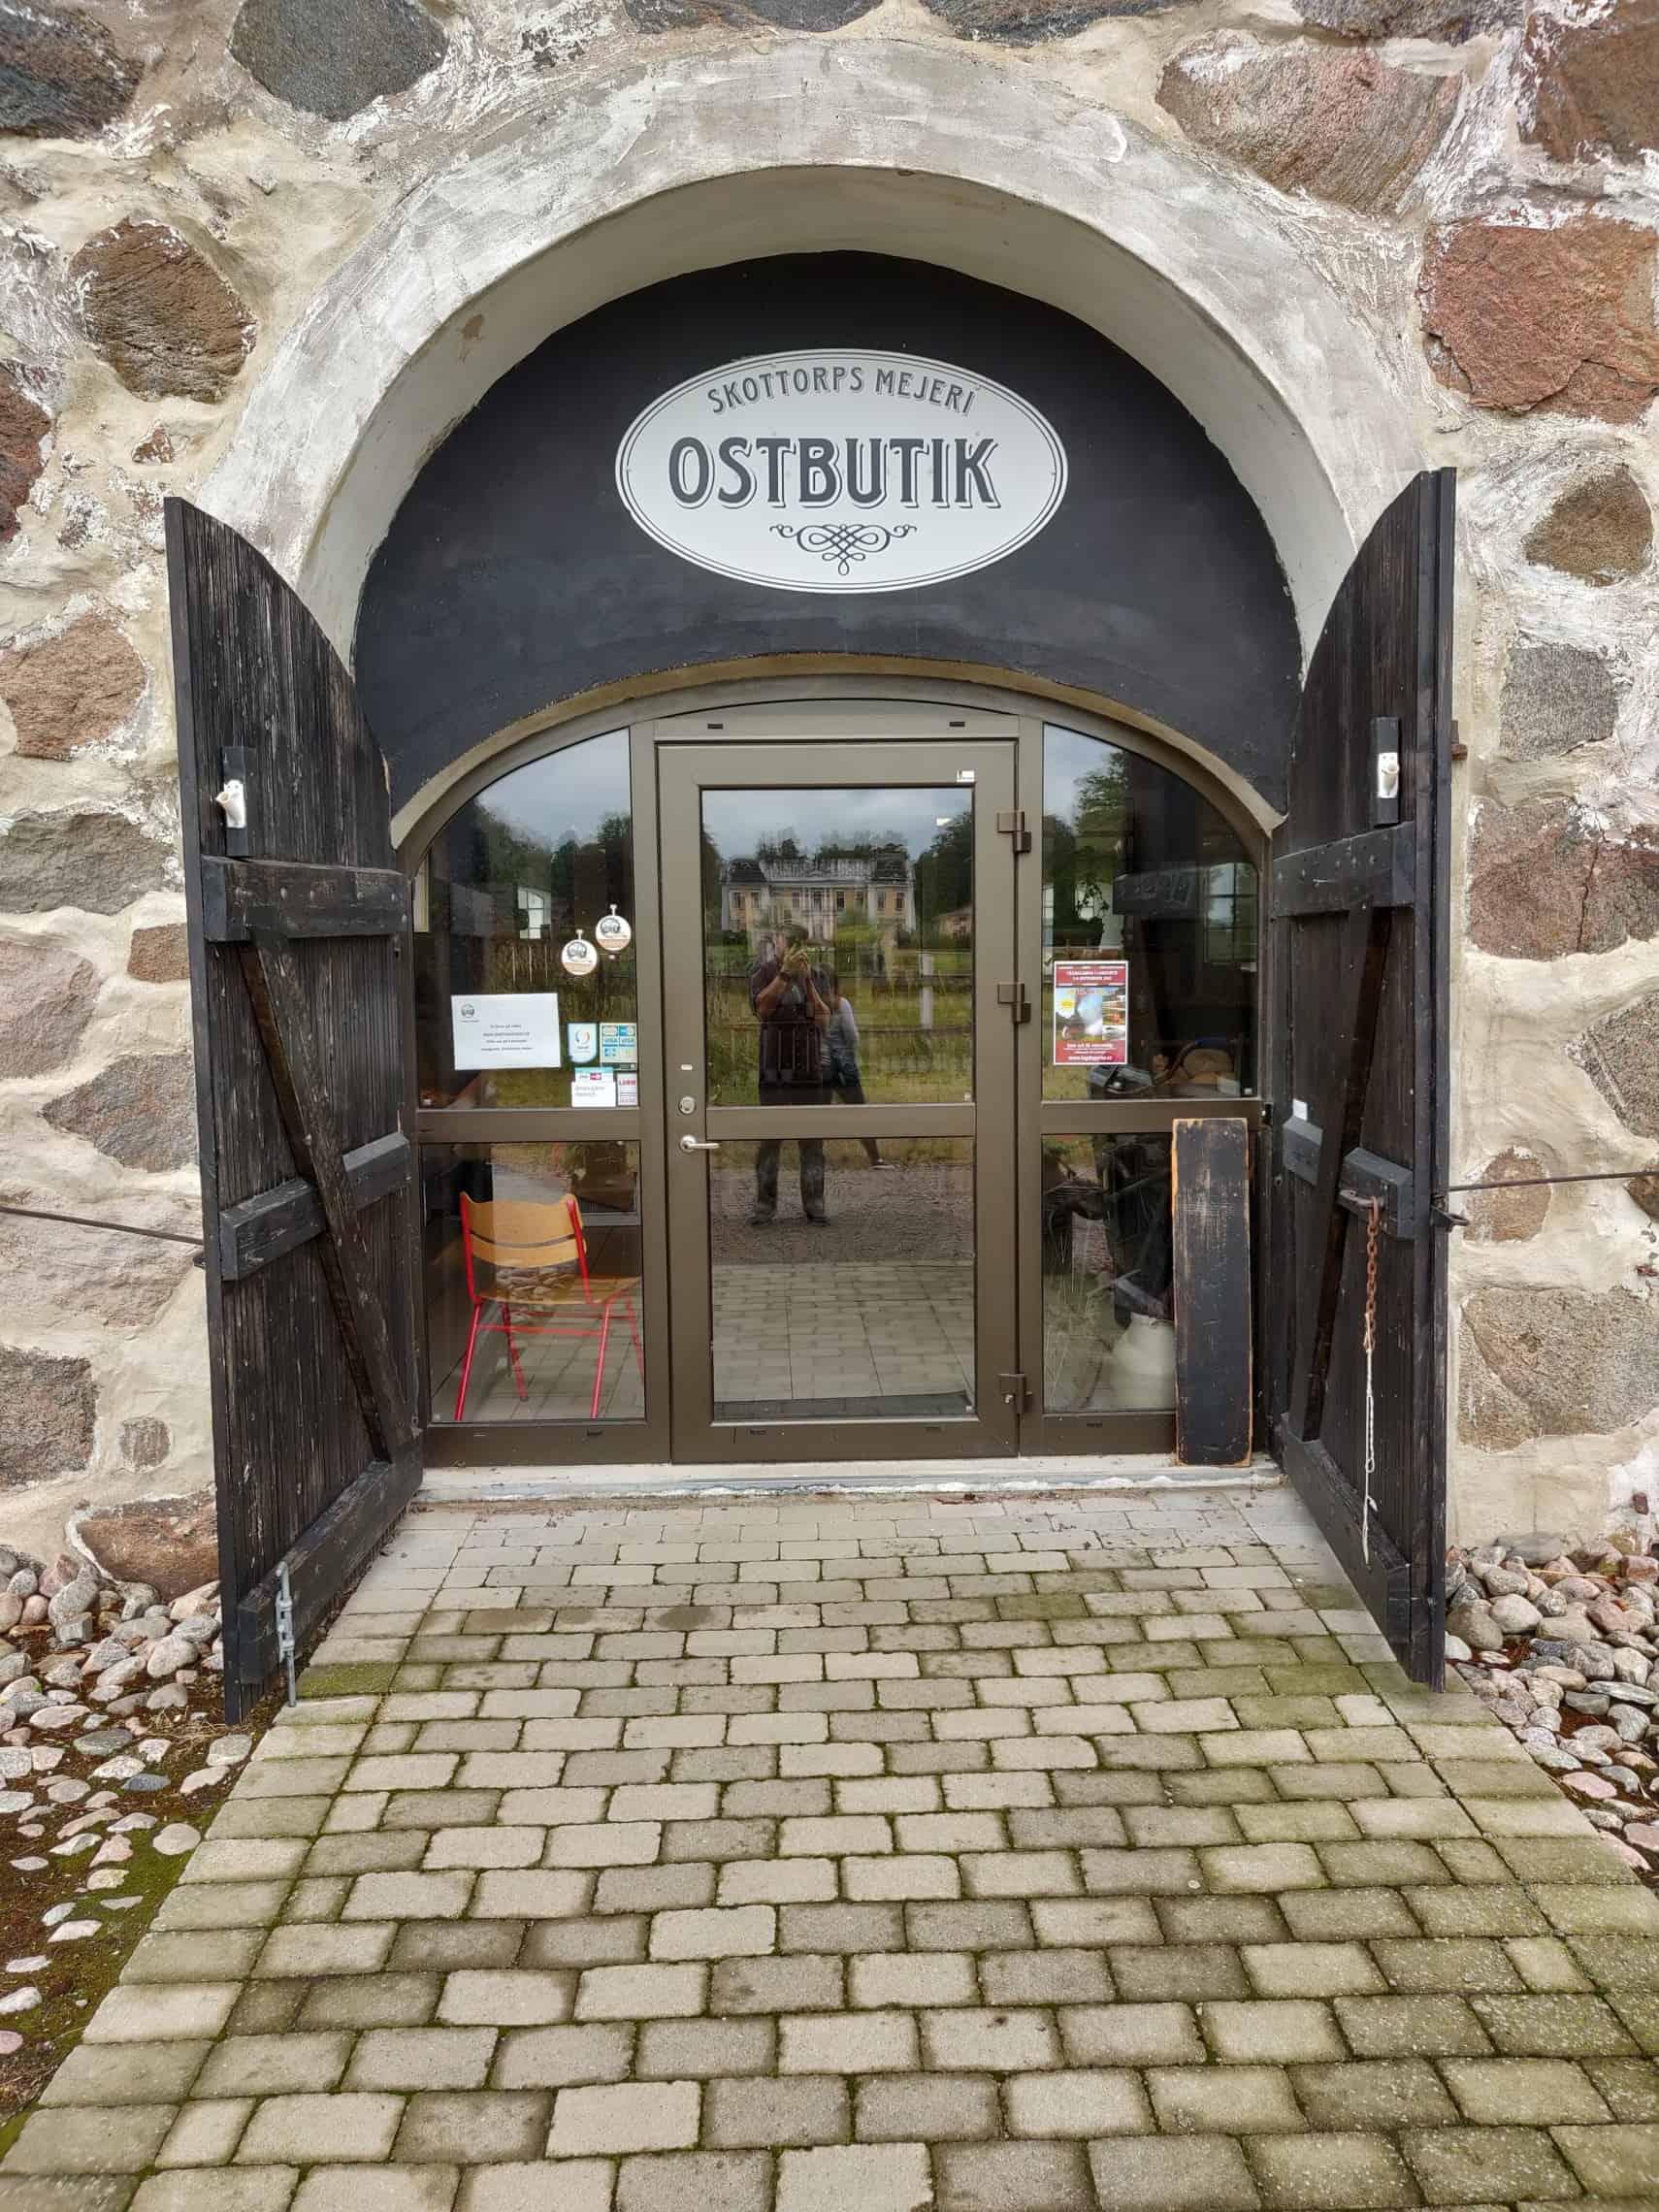 Matresa i södra Sverige 5